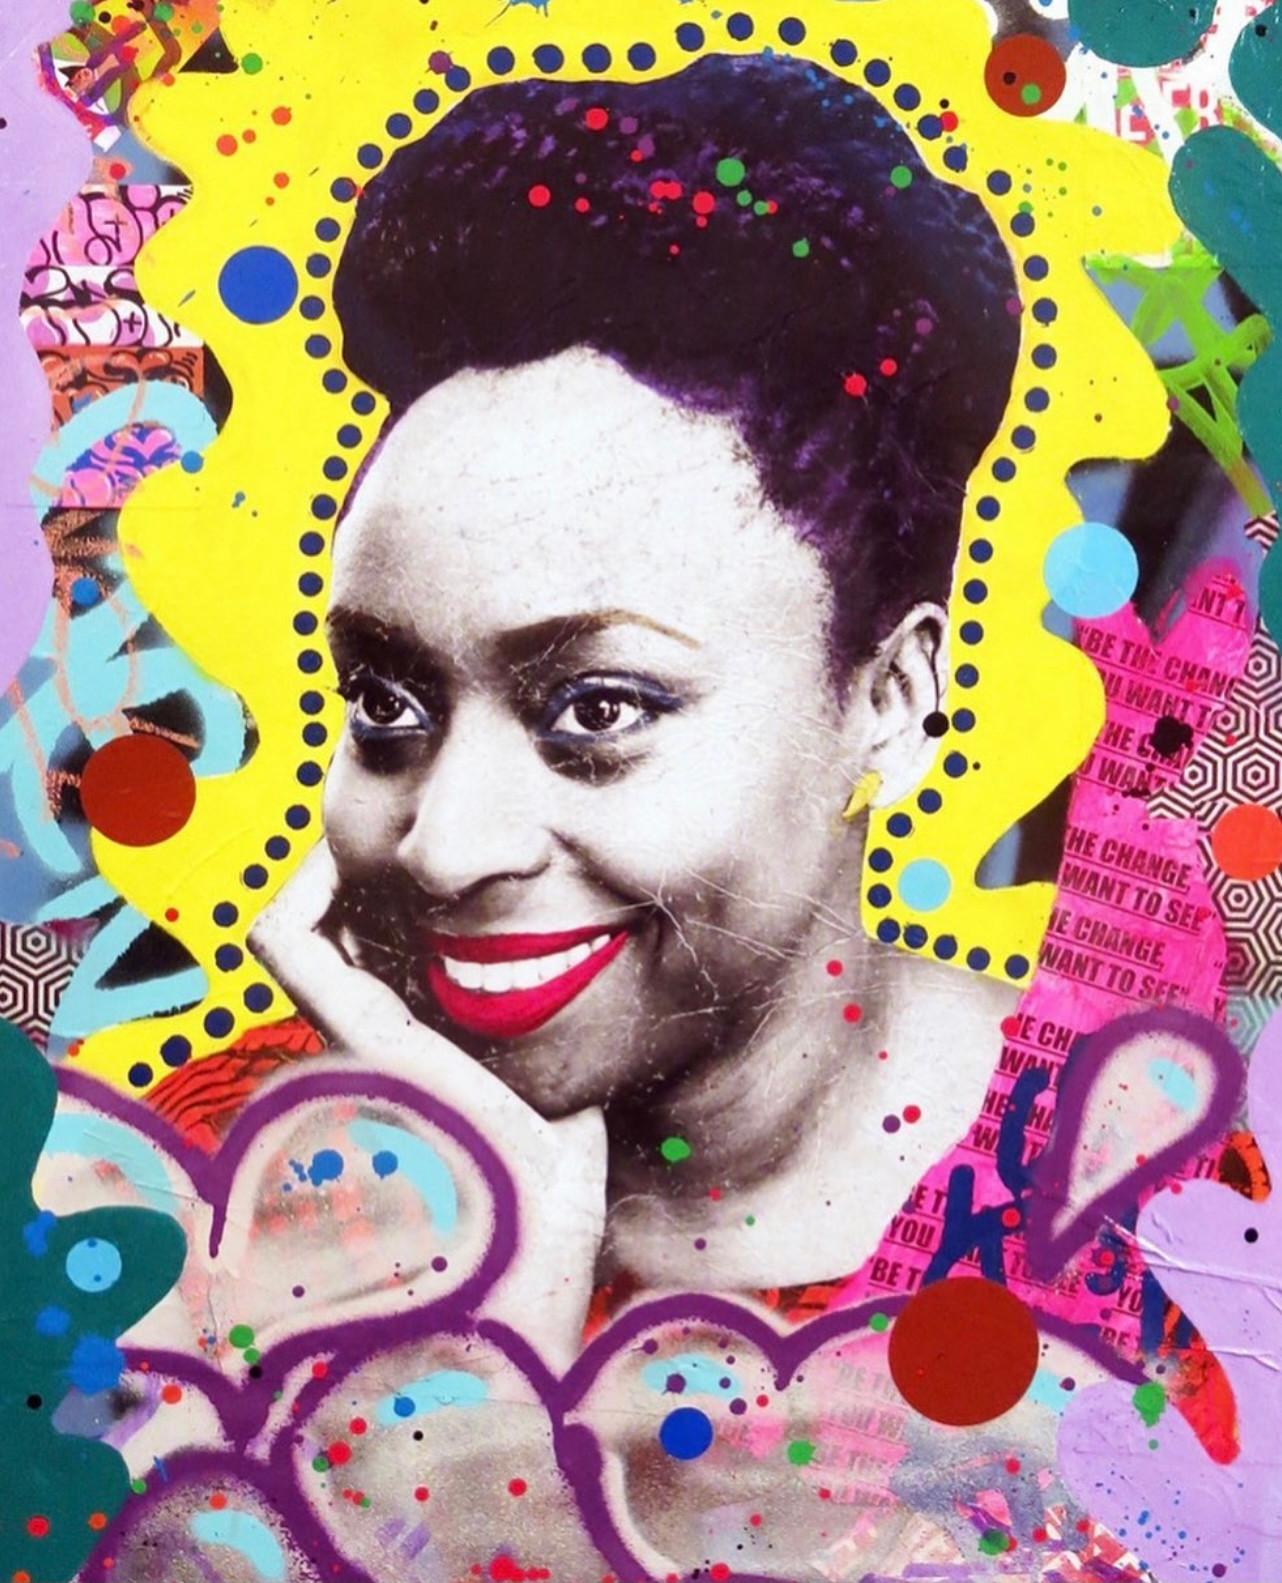 Street Art Portrait Collage - age 11+